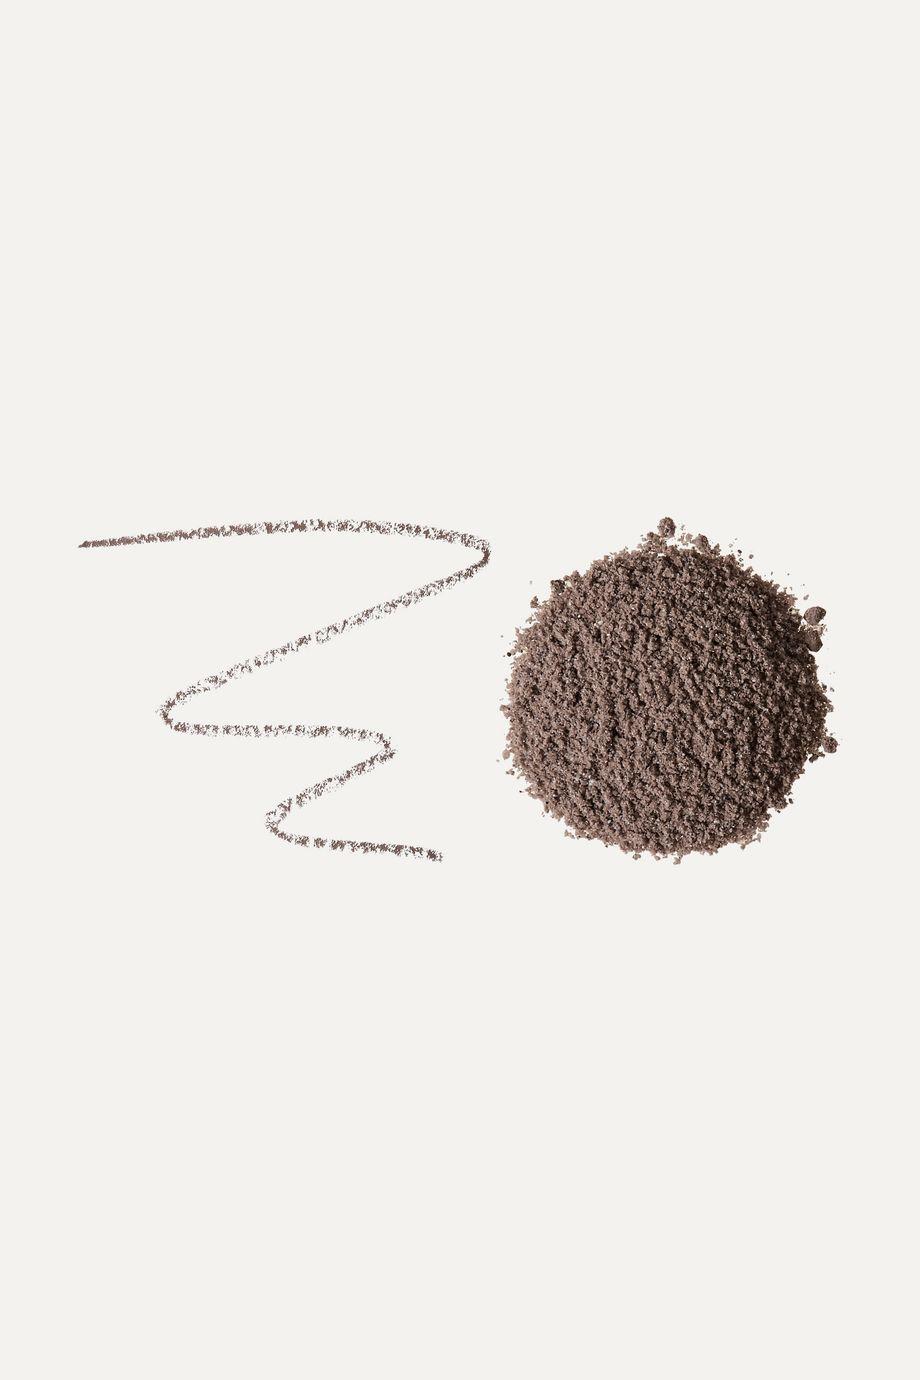 LashFood BrowFood Aqua Brow Powder + Pencil Duo - Taupe